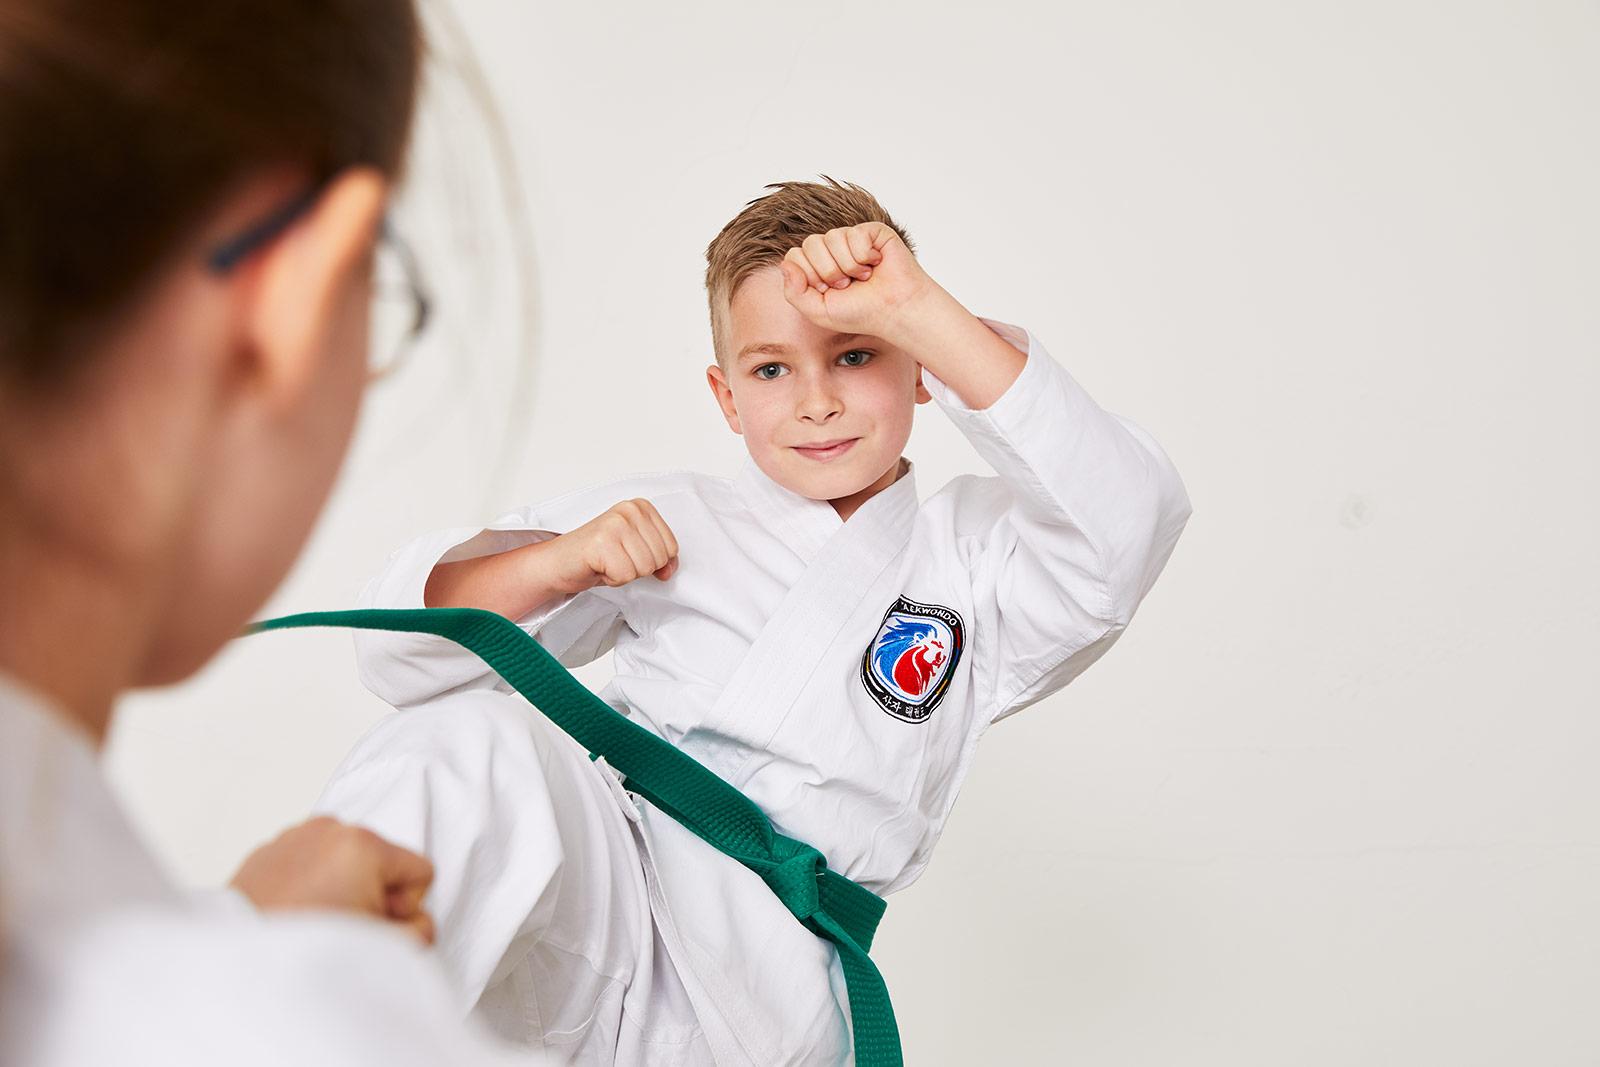 Taekwondo-Grüngurt Junge Close